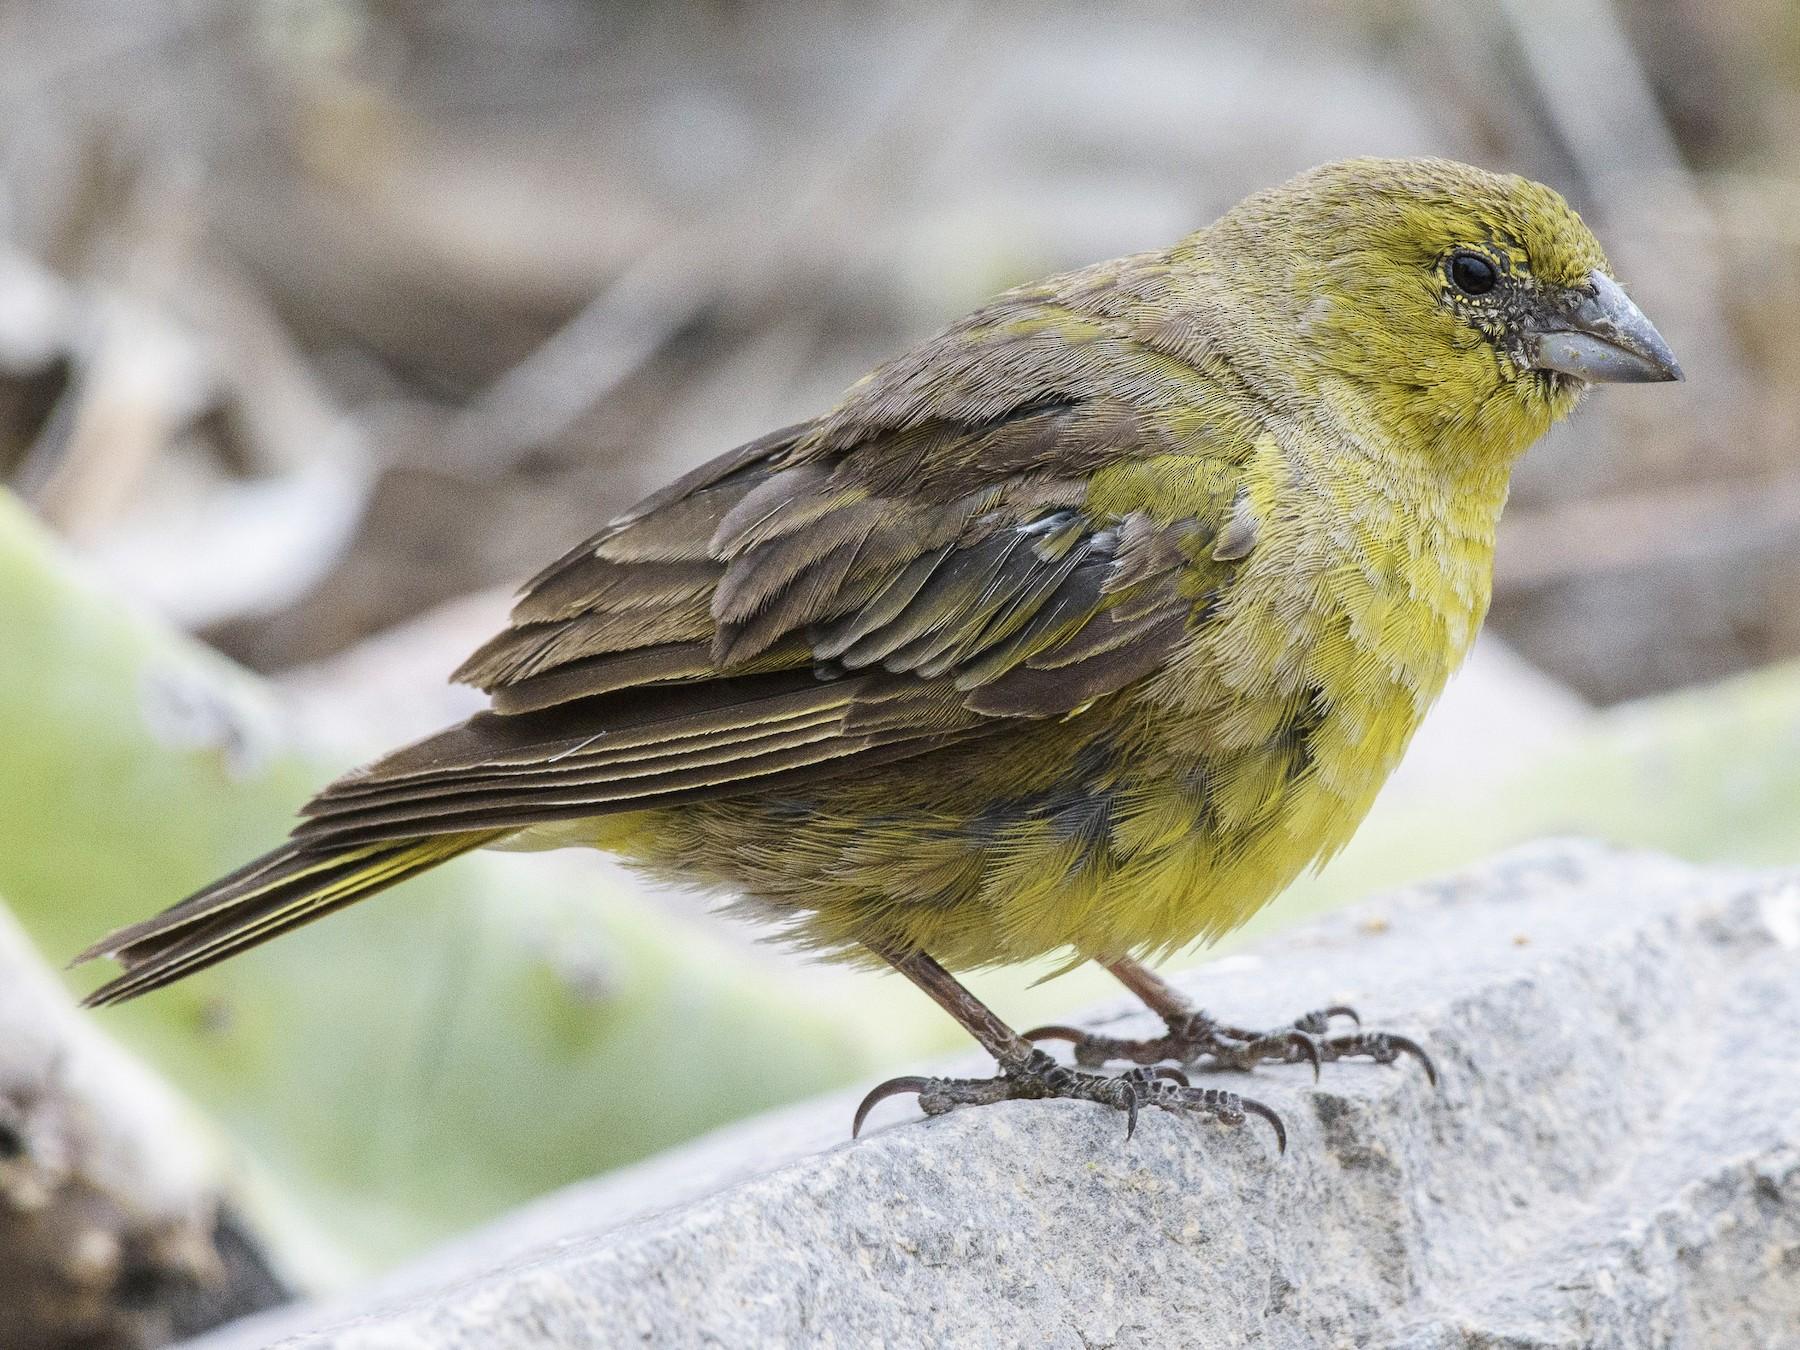 Greenish Yellow-Finch - VERONICA ARAYA GARCIA